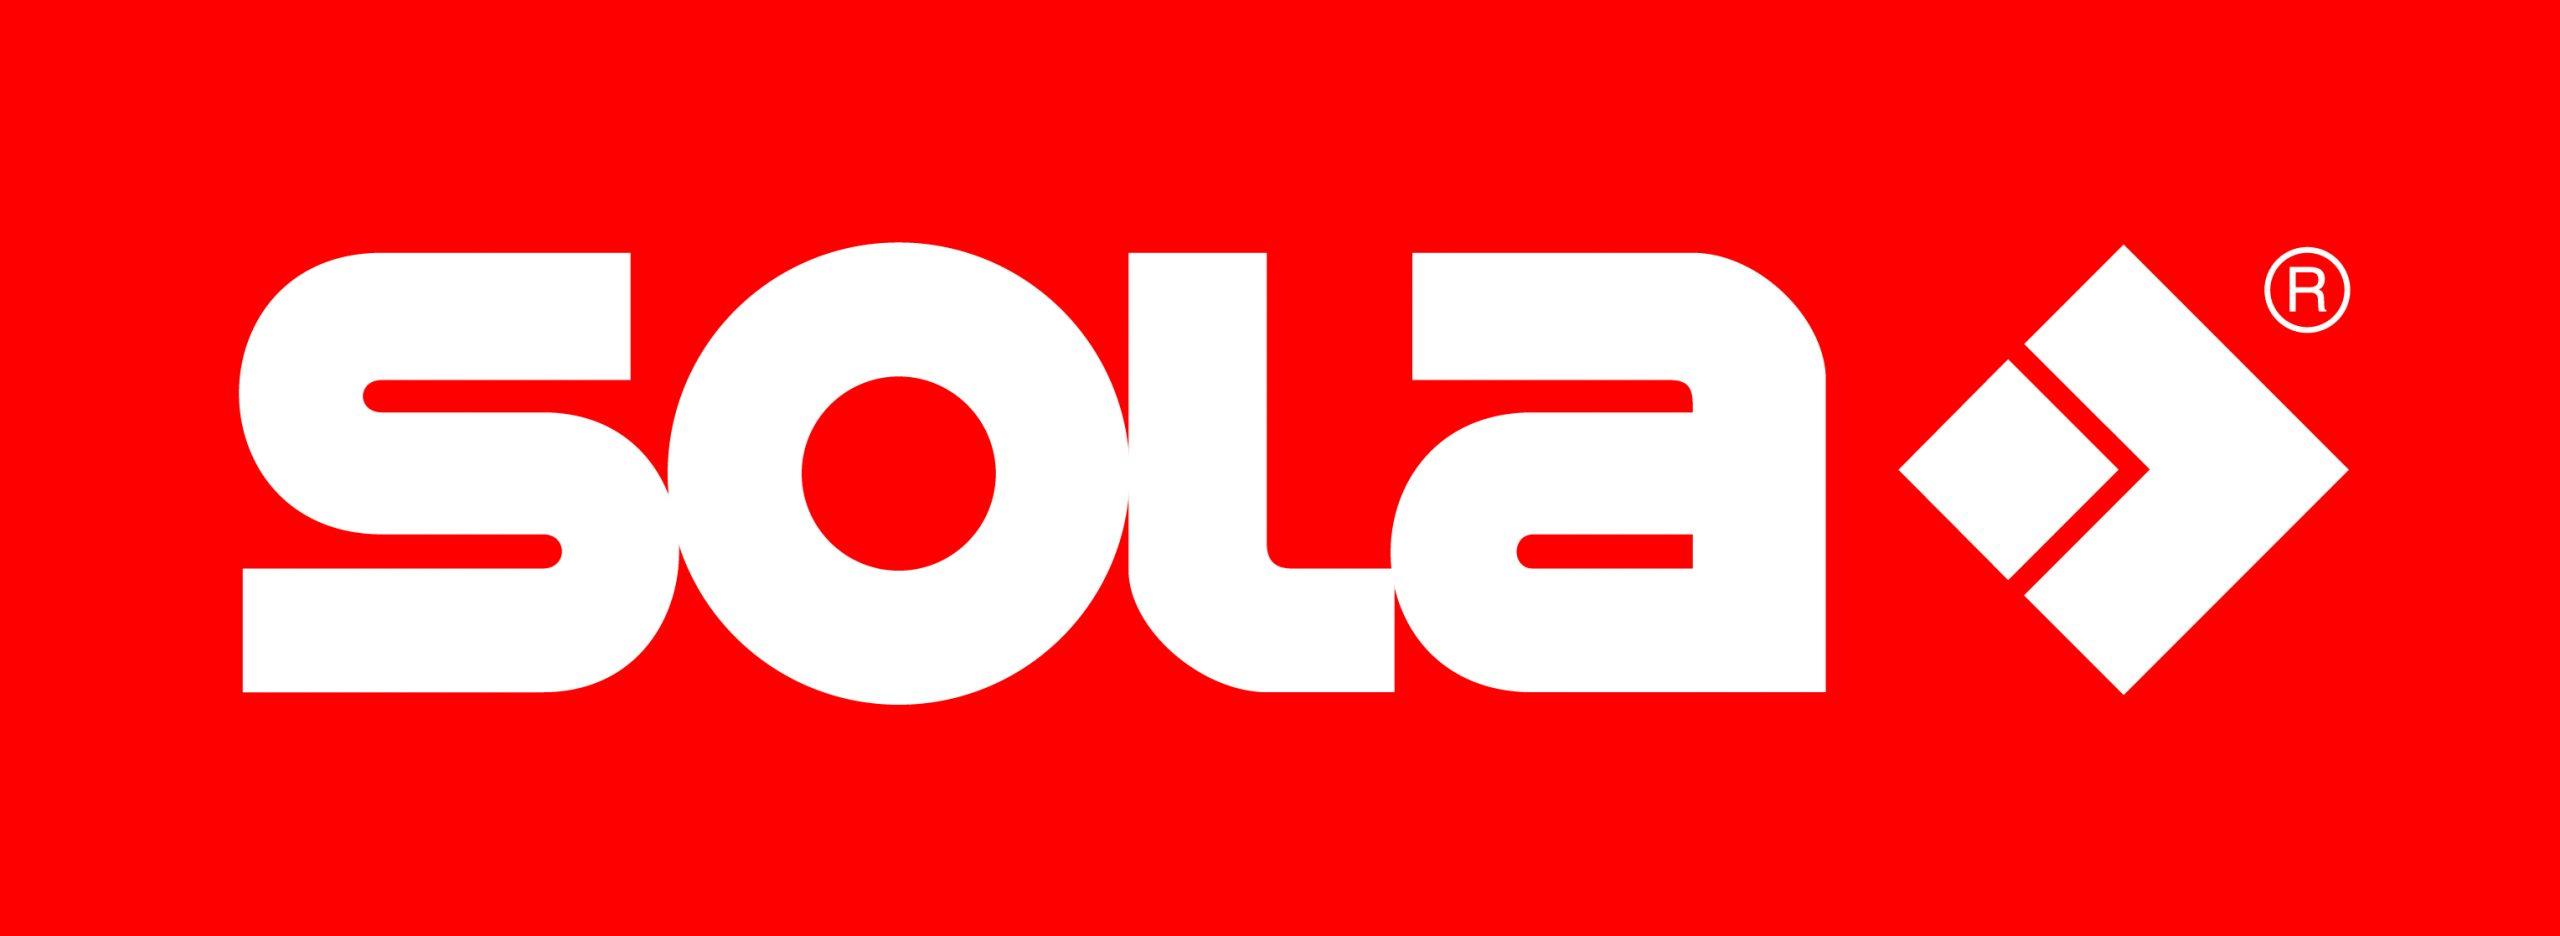 LOG_OWN_SOLA_OHNE_CLAIM_NEG_2014_CMYK